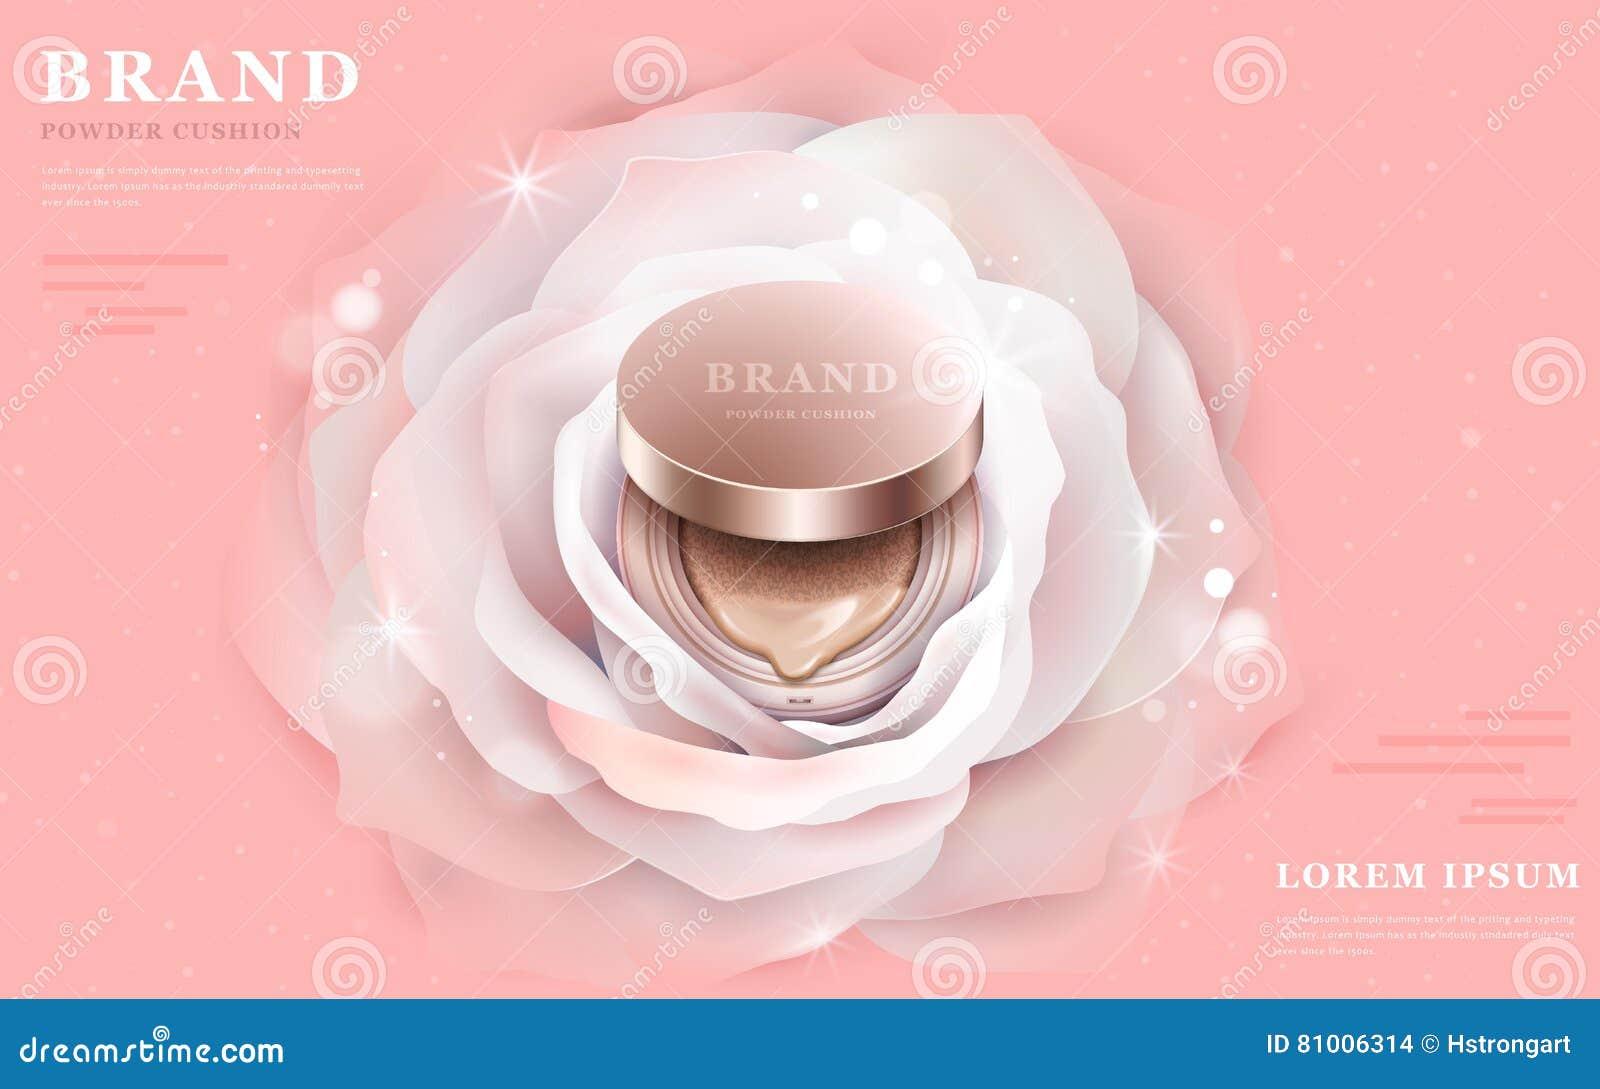 Graceful Powder Cushion Ads Stock Vector - Illustration of female ...